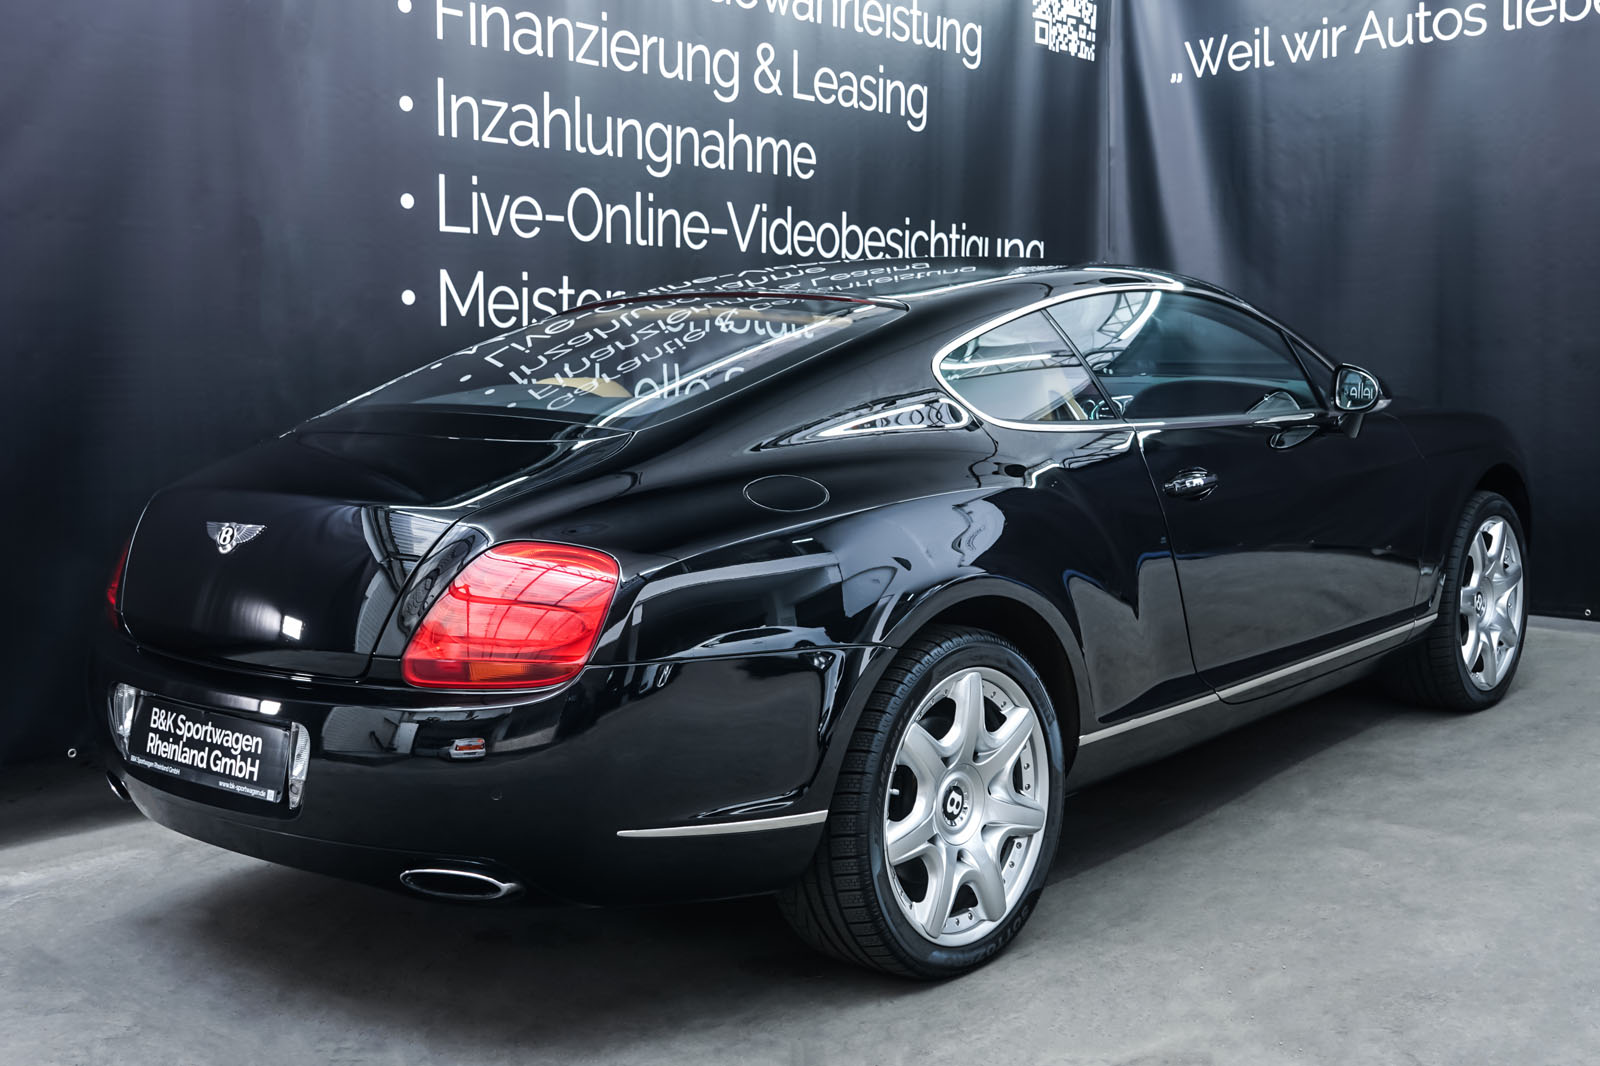 Bentley_Continental_GT_Schwarz_Beige_BEN-1159_13_w